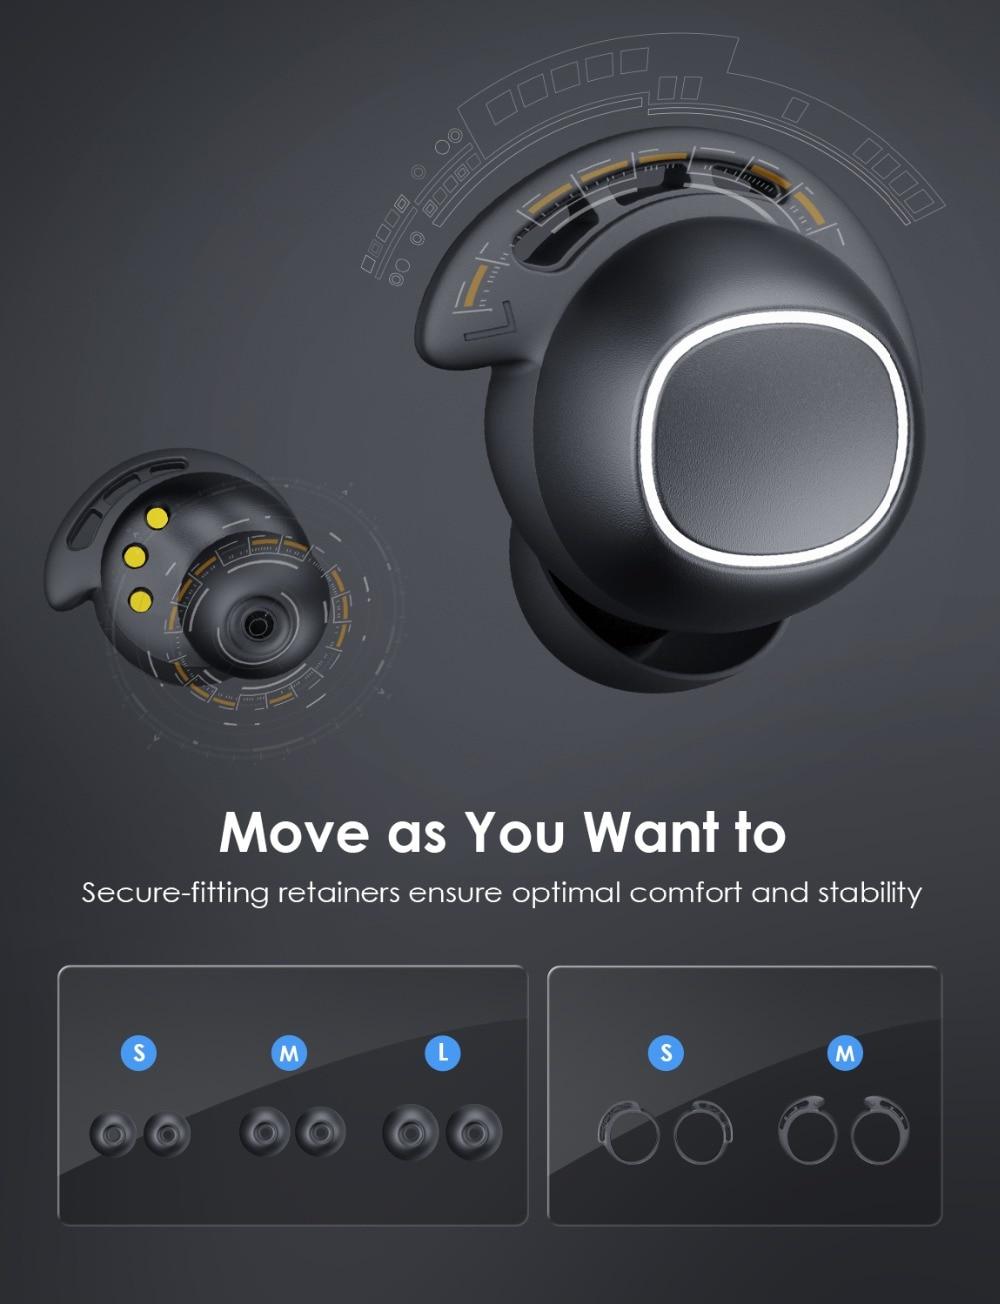 Mpow M30 Wireless Earphones TWS Bluetooth 5.0 Earphone Touch Control Earbuds With IPX7 Waterproof For iPhone Xiaomi Mi 10 Pro (3)